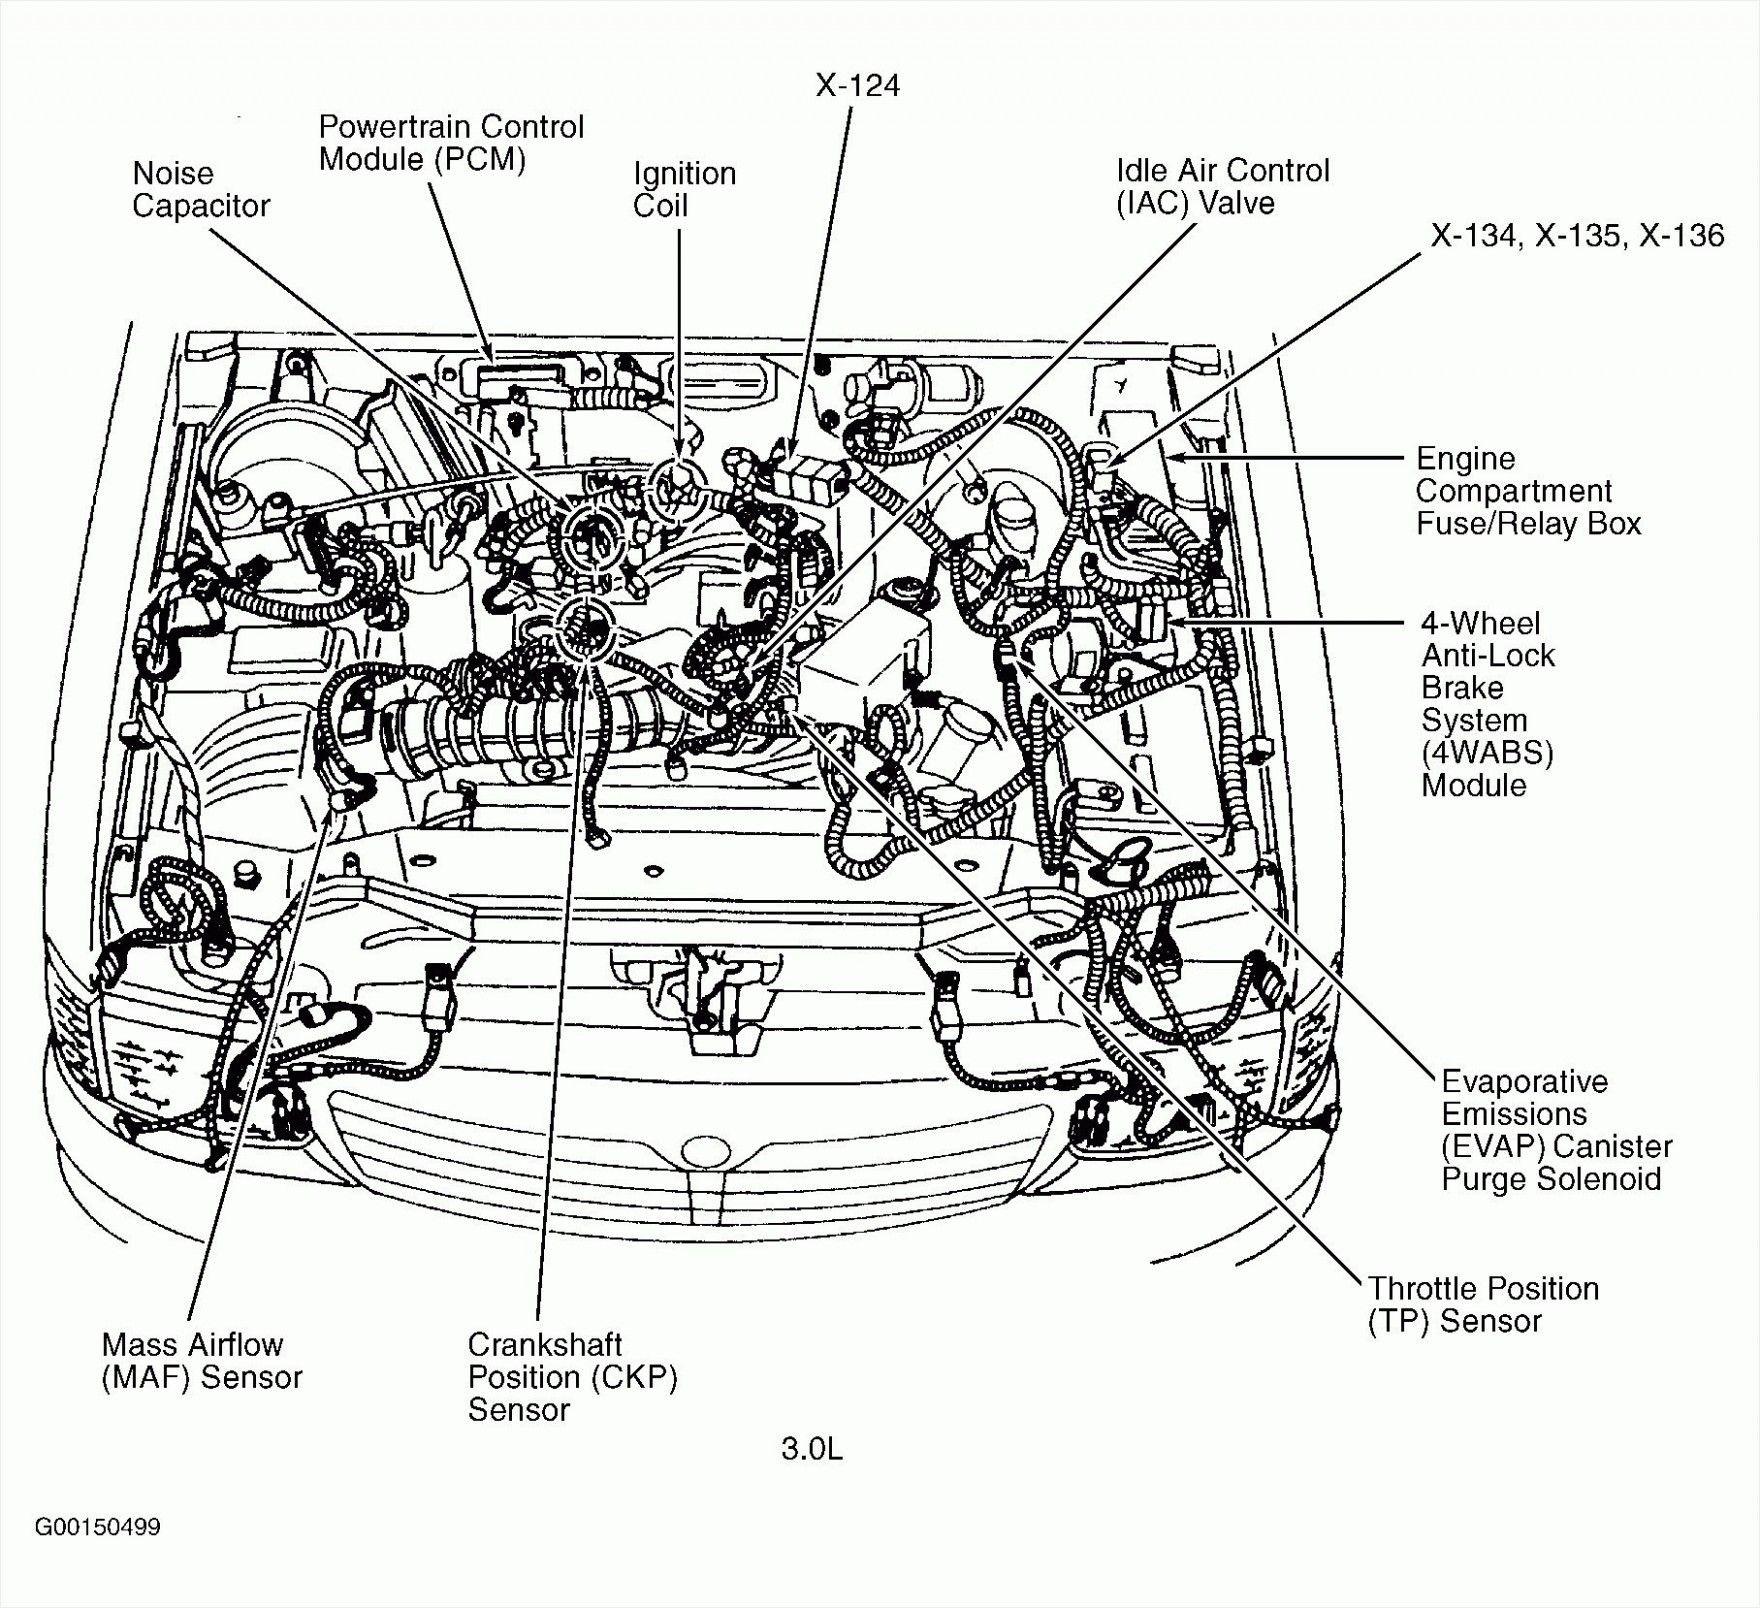 2013 ford Escape Engine Bay Diagram 6 0 Engine Bay Diagram Full Hd Version Bay Diagram Losh Of 2013 ford Escape Engine Bay Diagram